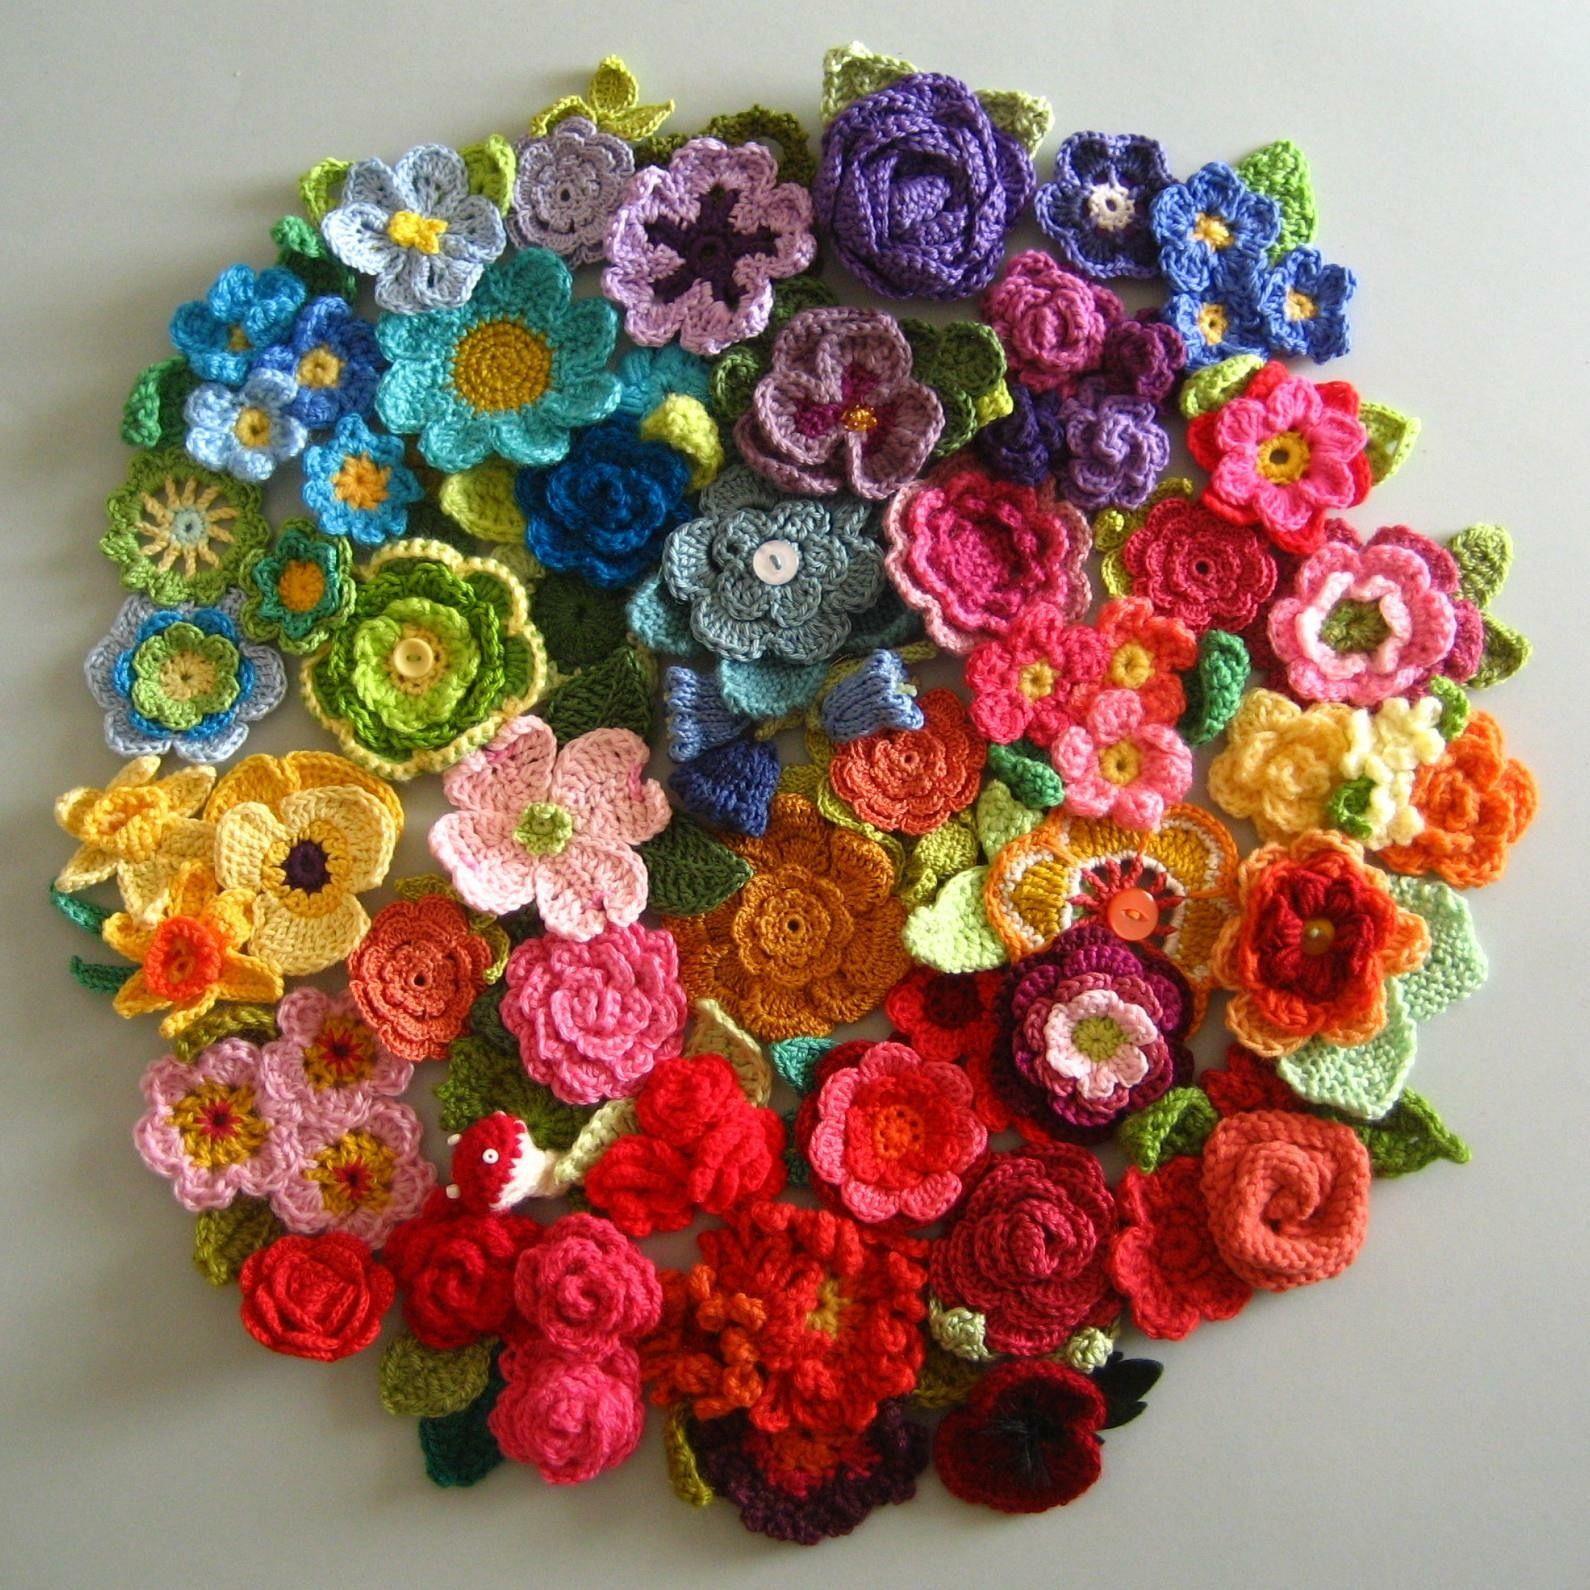 Pin by cyndie strauss on crochet pinterest crochet crochet sending you a beautiful bouquet of yarn flowers to brighten your day x izmirmasajfo